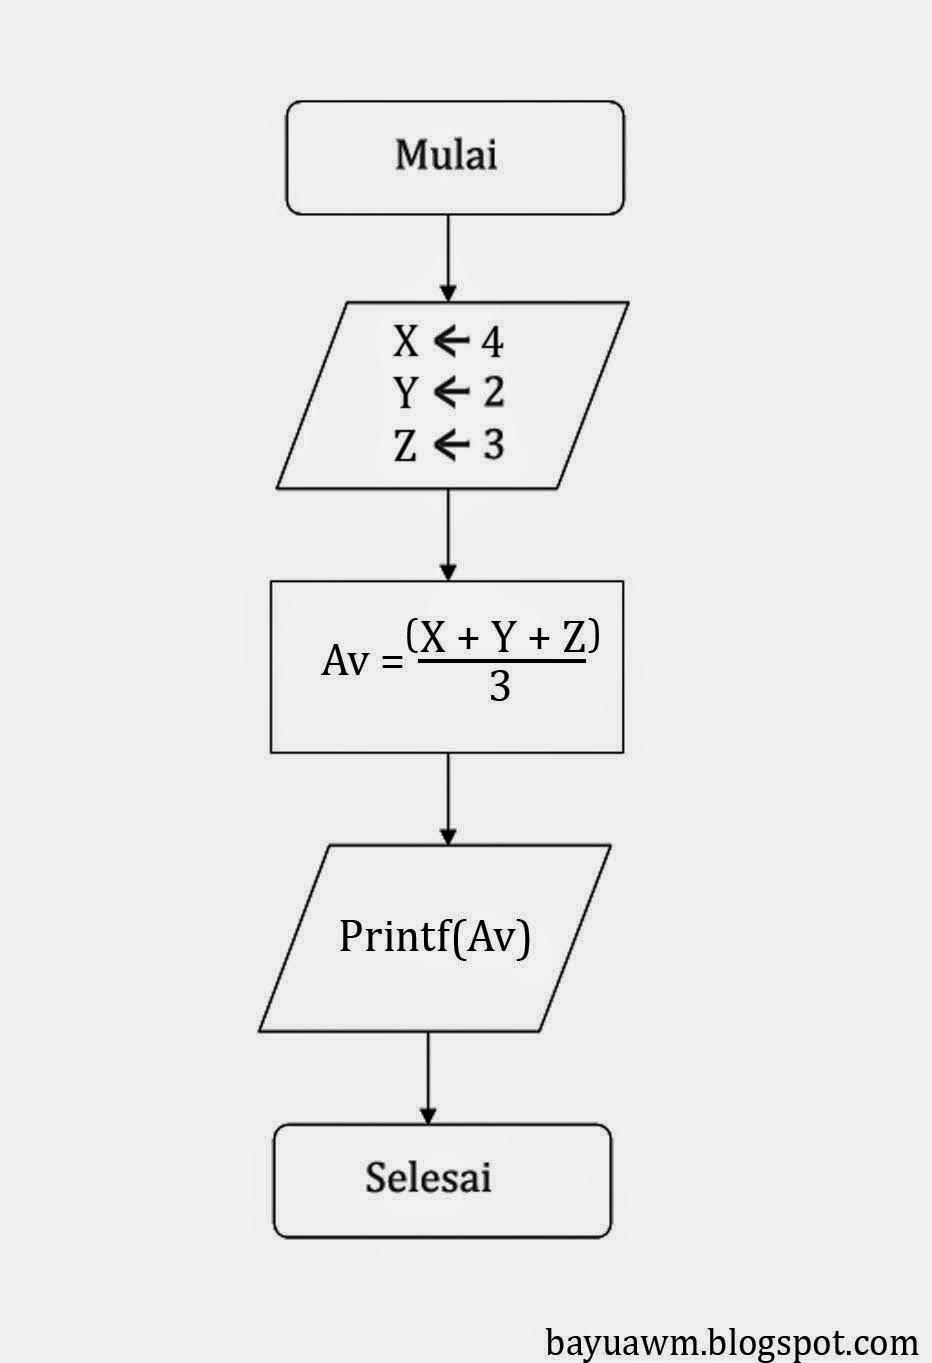 Algoritma Dan Pemrograman Menghitung Dan Mencetak Rata Rata Ke 3